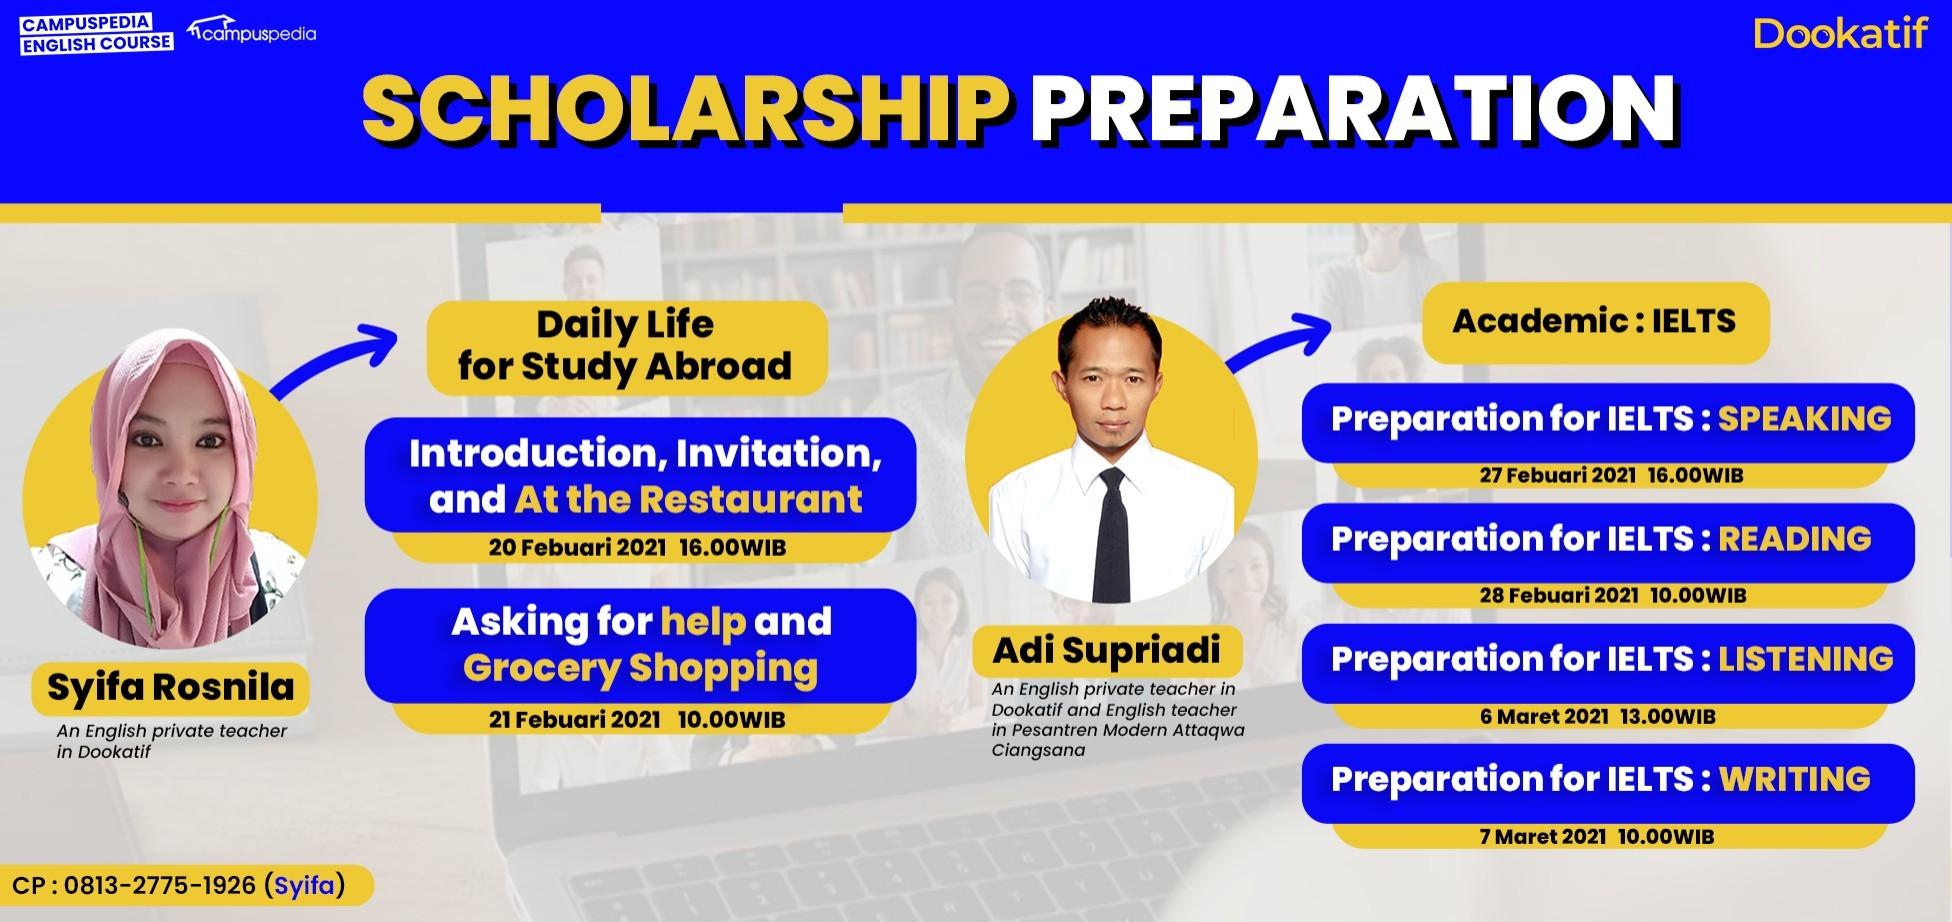 Scholarship Preparation